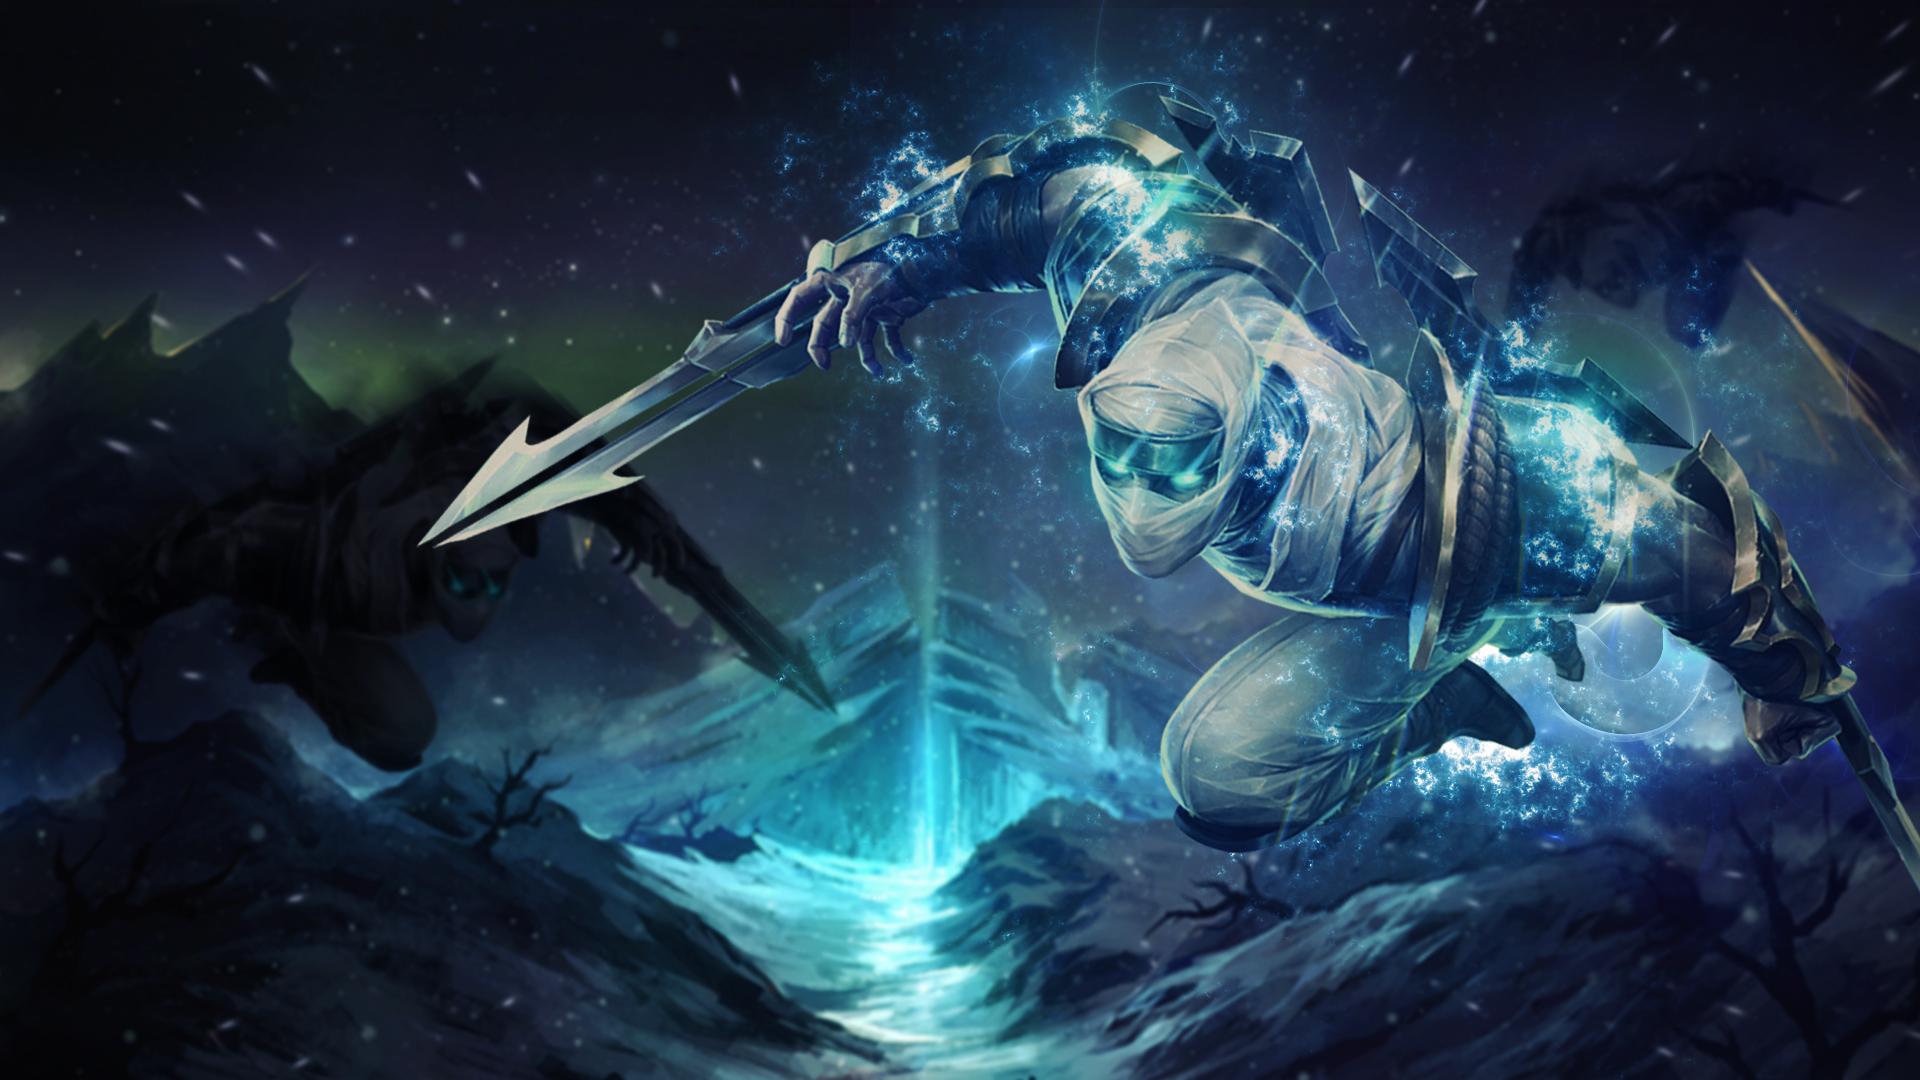 League of Legends Desktop Wallpaper - WallpaperSafari